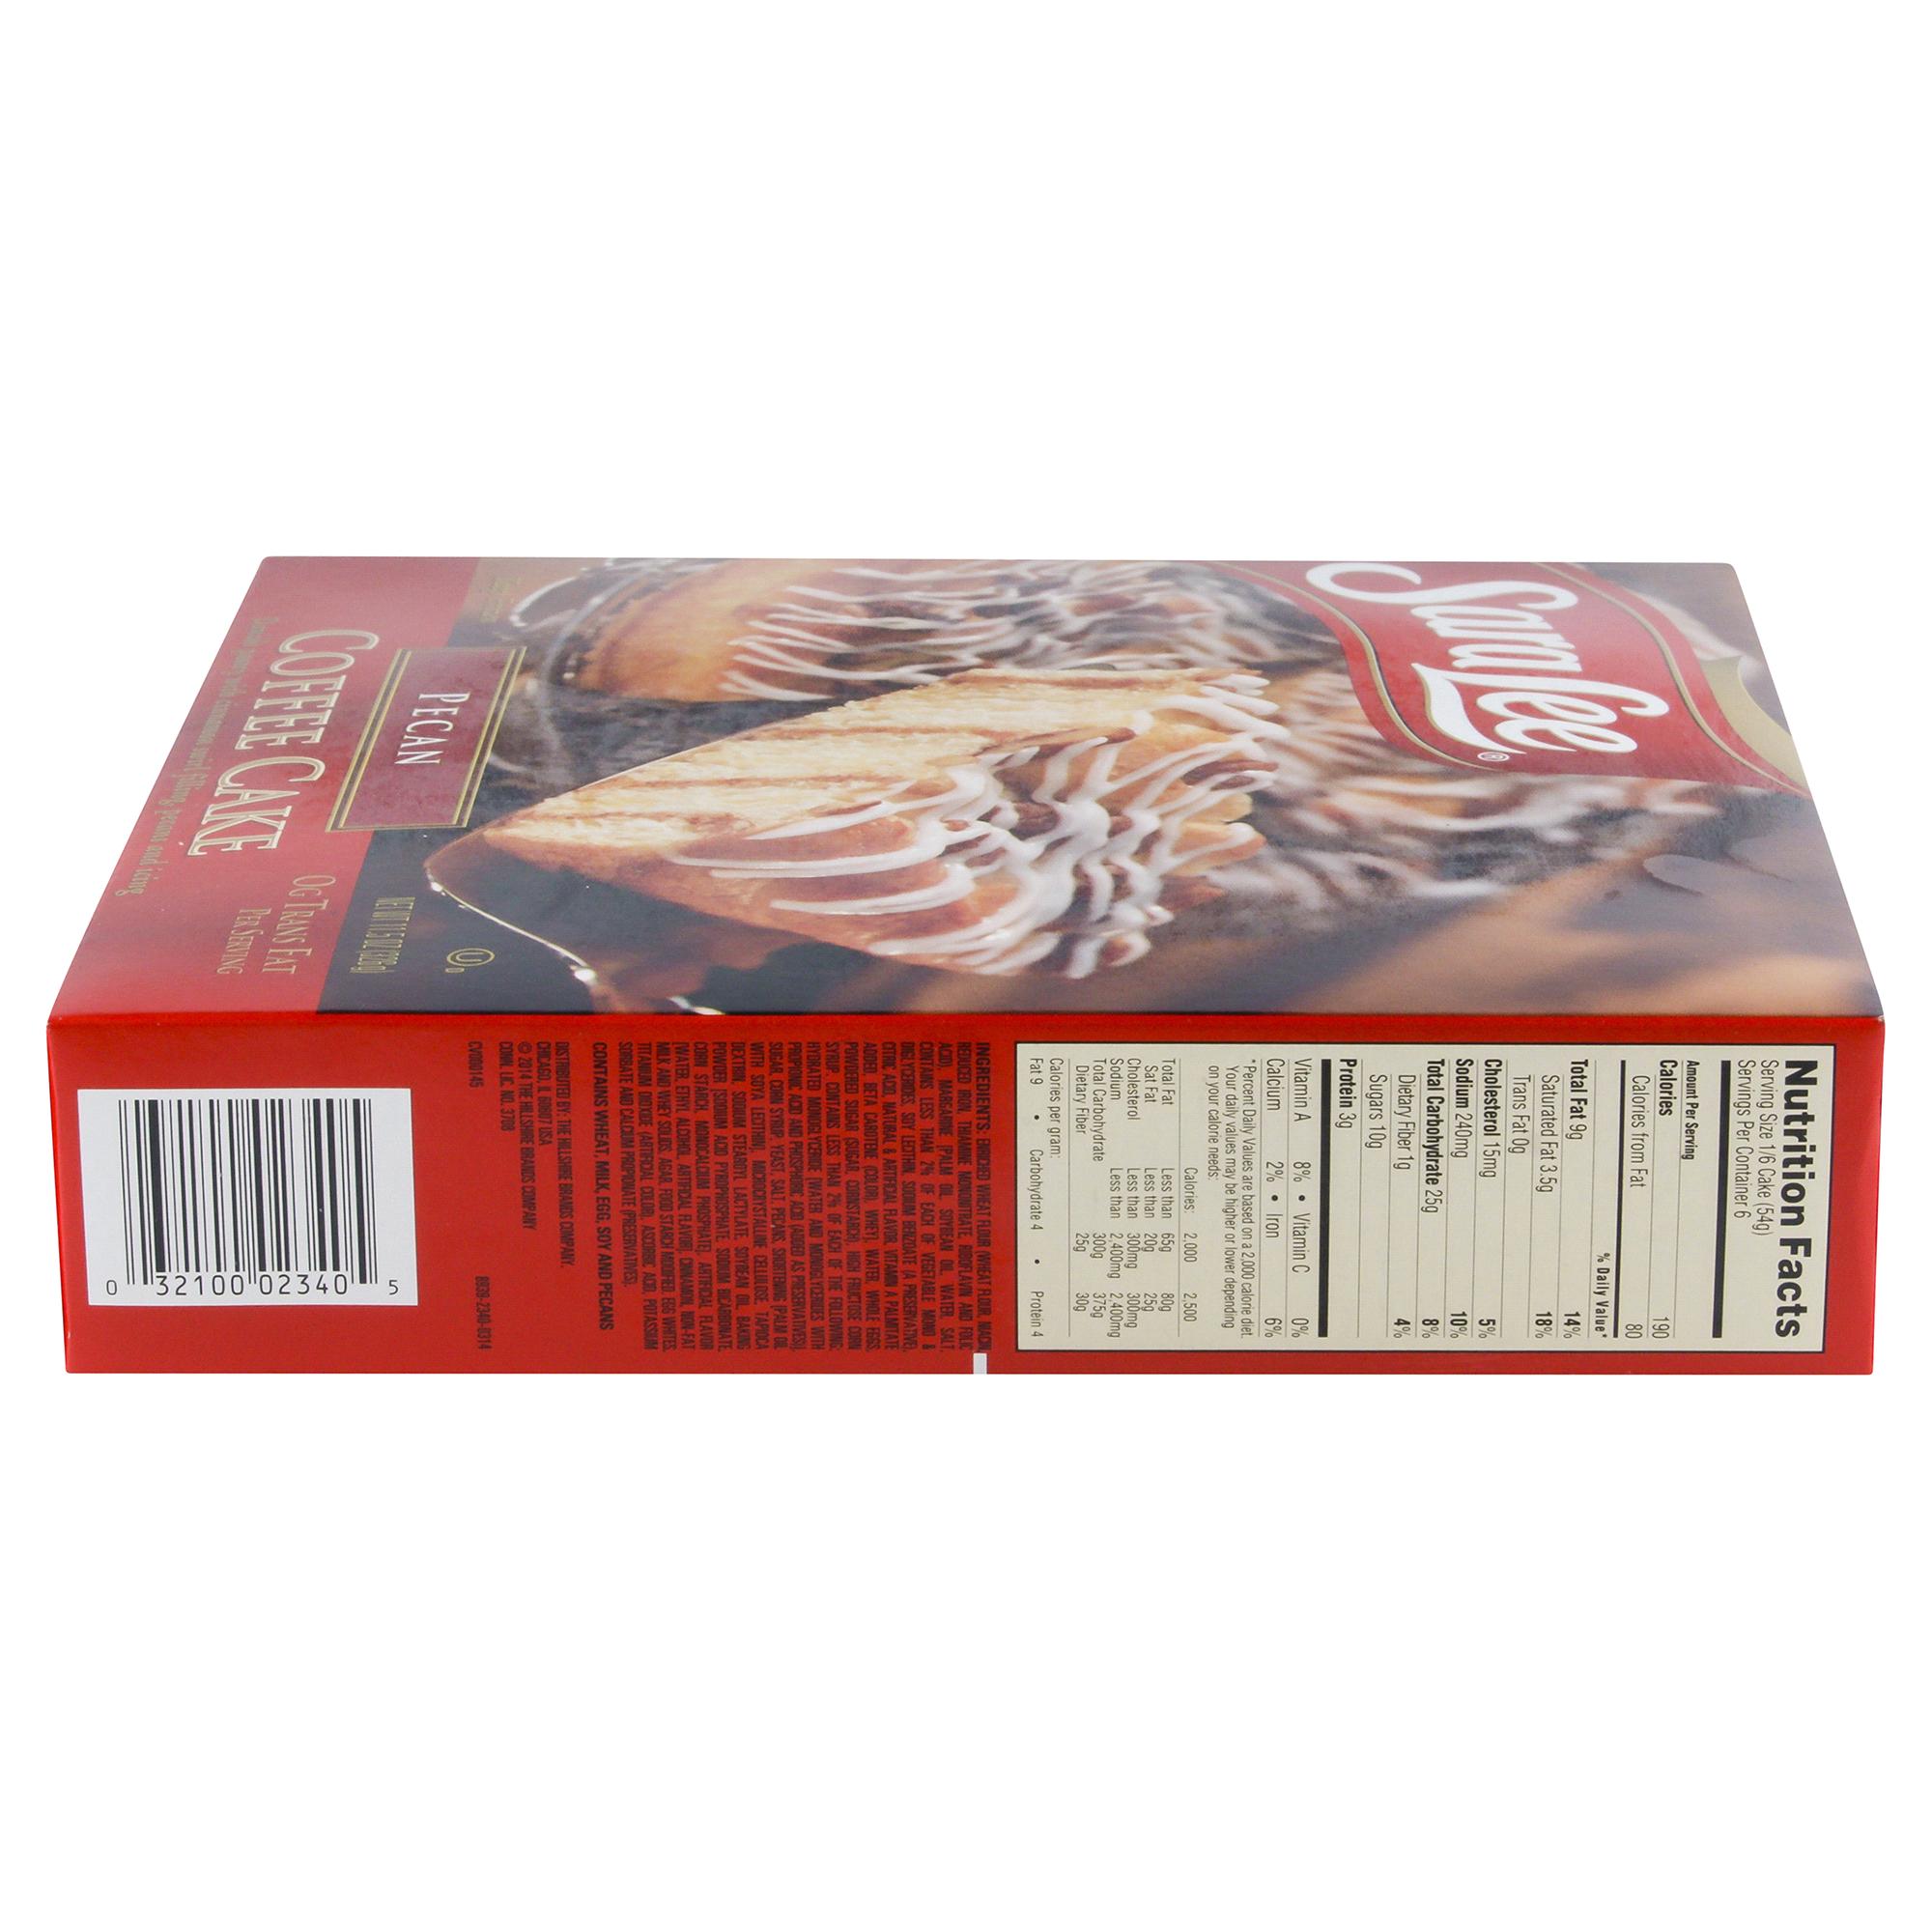 Sara Lee Coffee Cake Pecan 11.5 oz  32692b63d